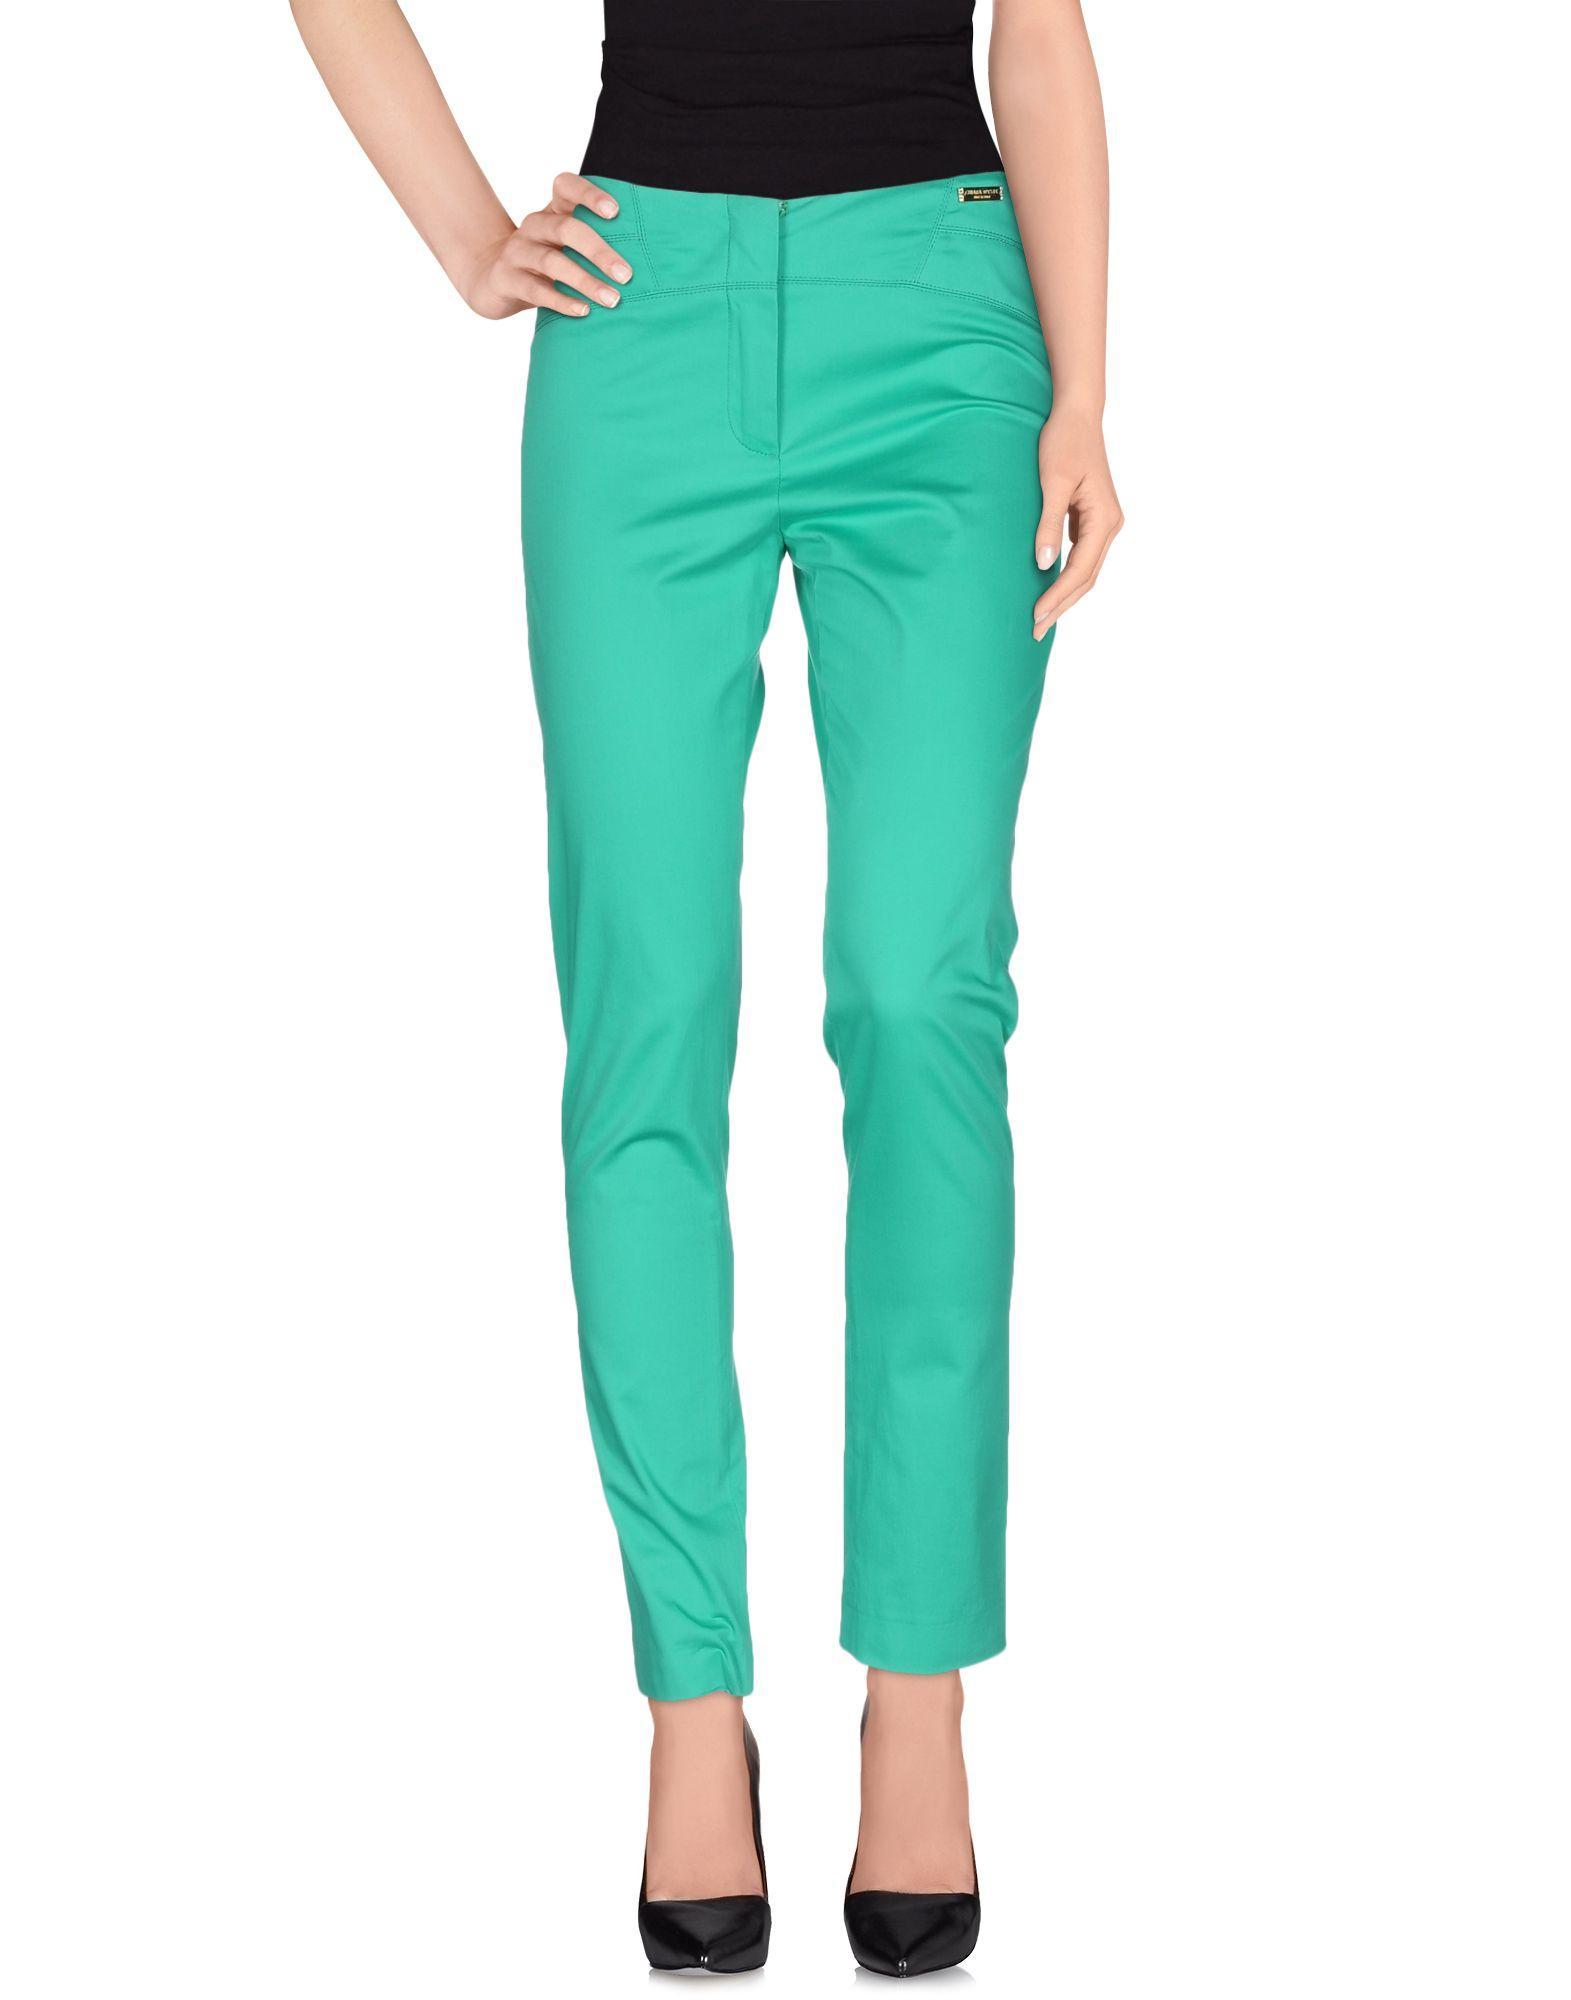 Chiara D'Este Casual Trouser in Green